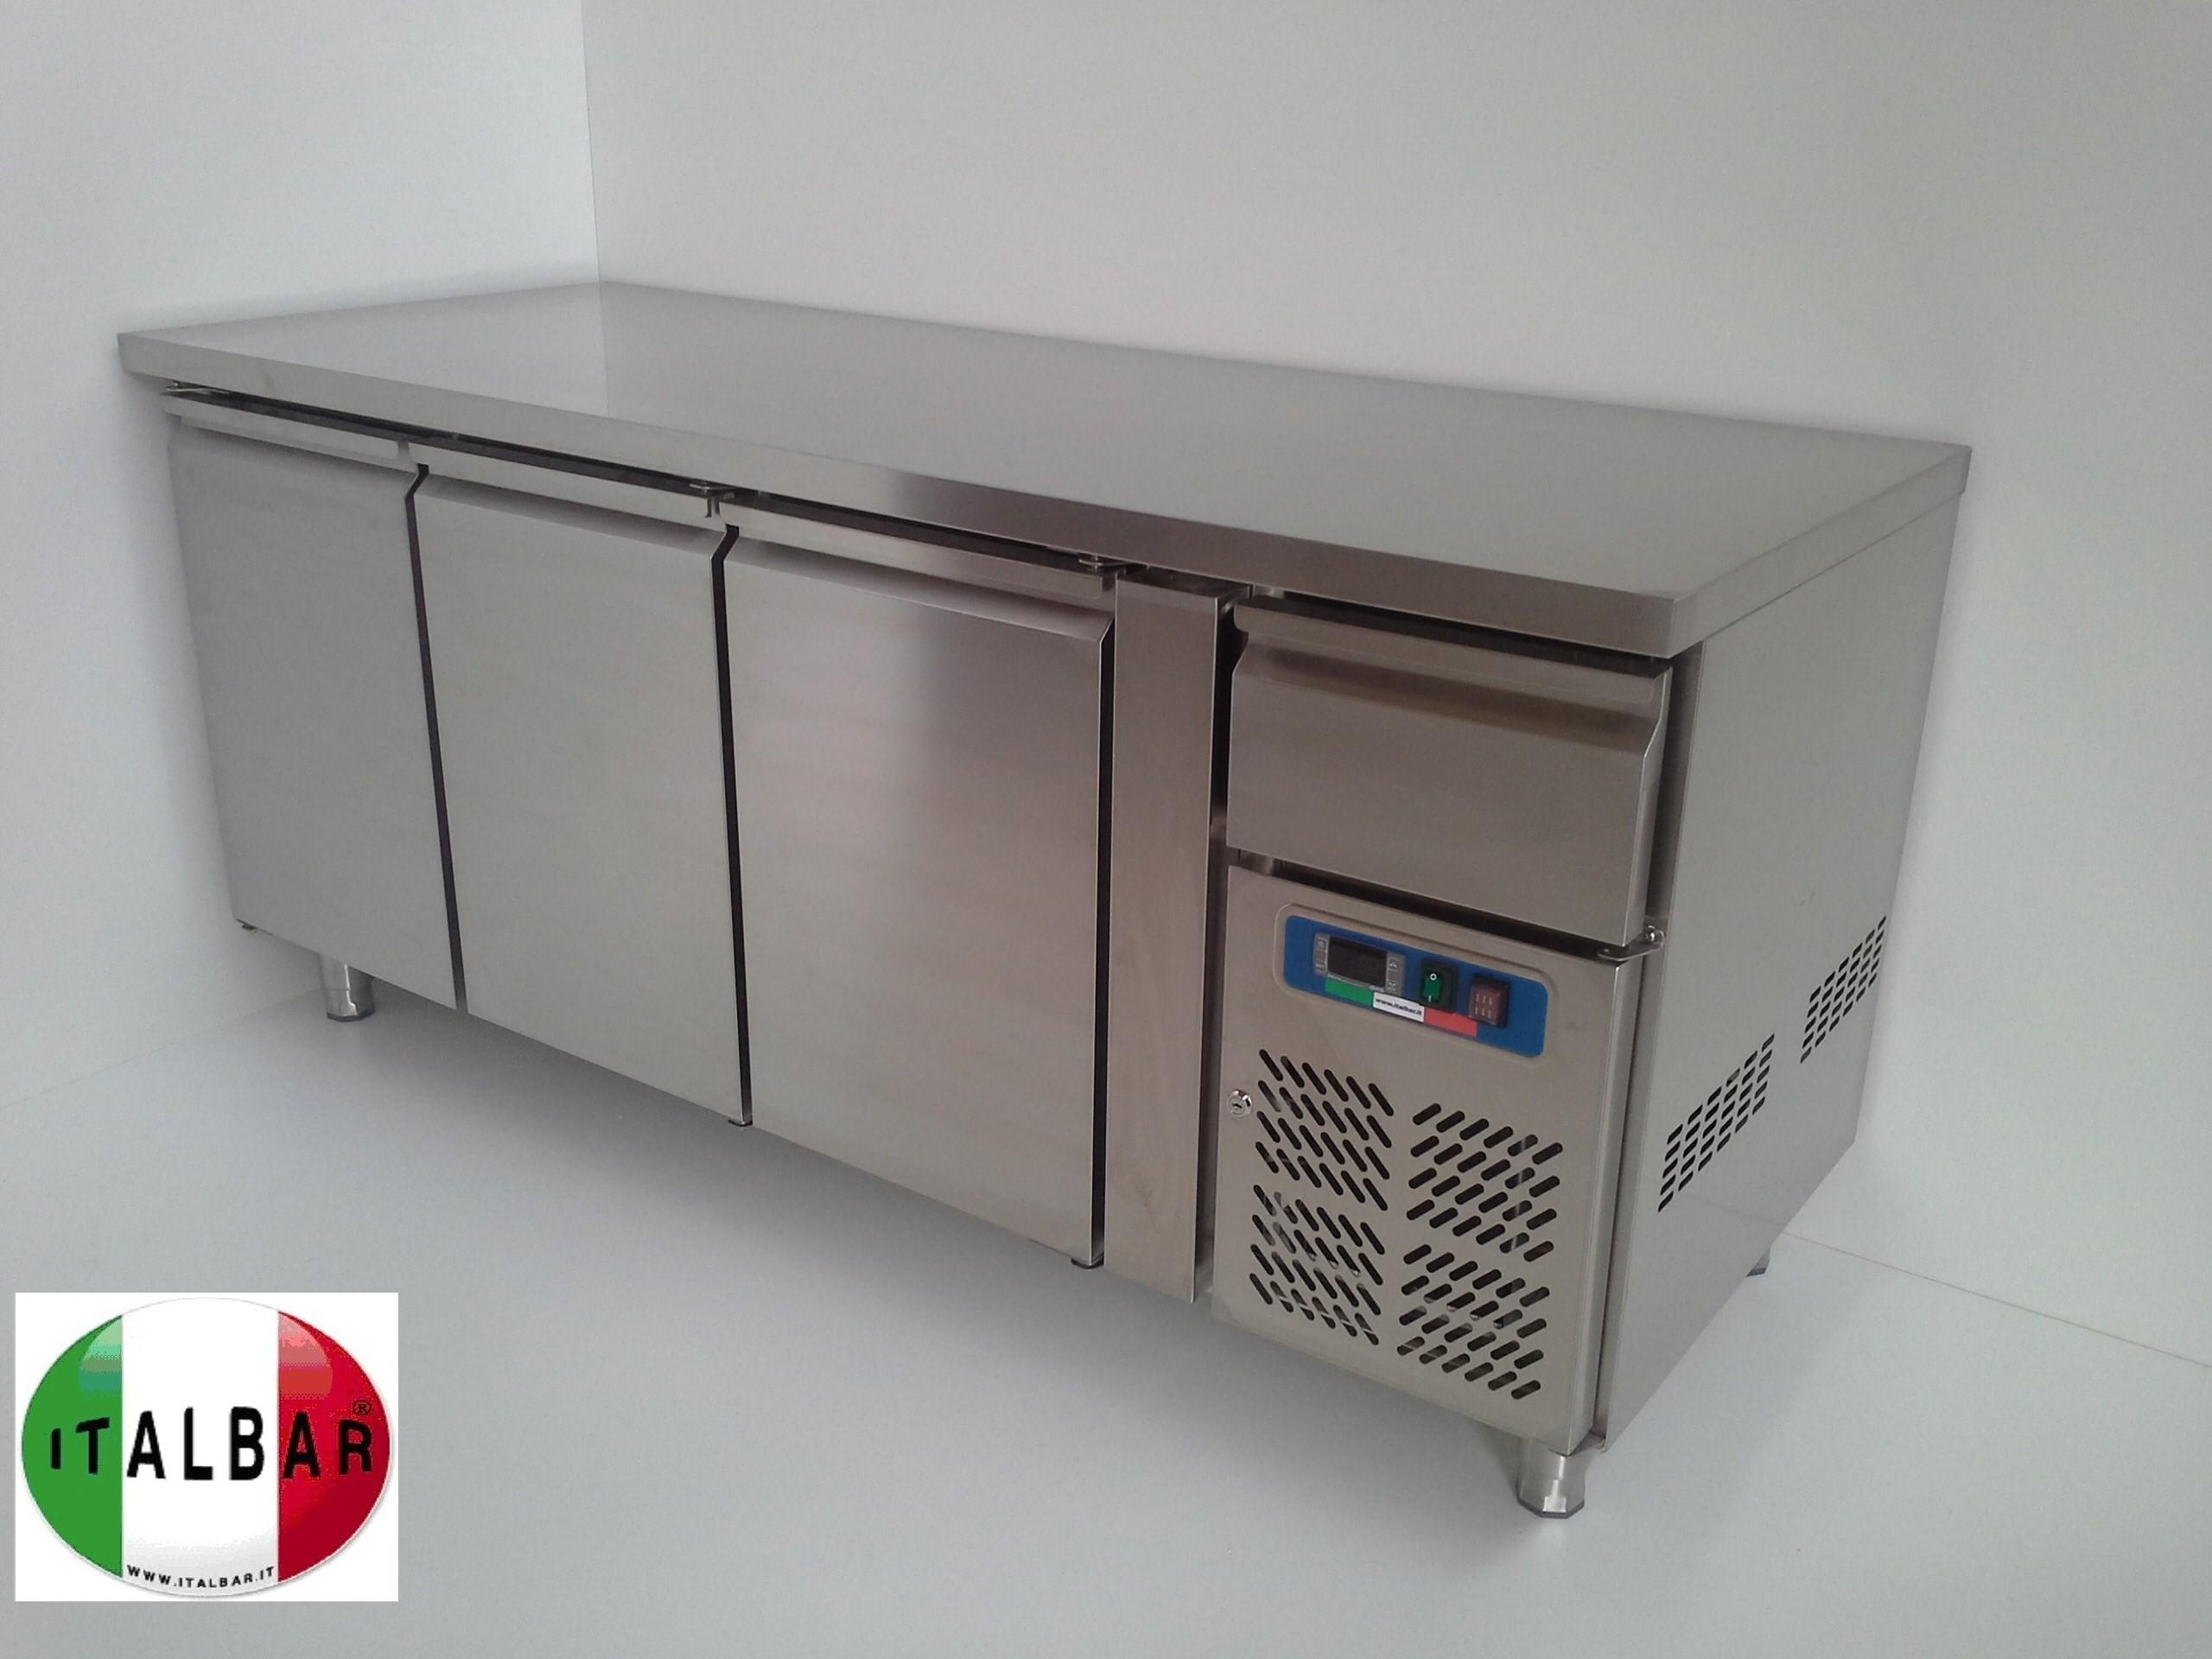 Banchi Da Lavoro Acciaio Per Cucina : Cucina acciaio usata. interesting beautiful with cucina acciaio